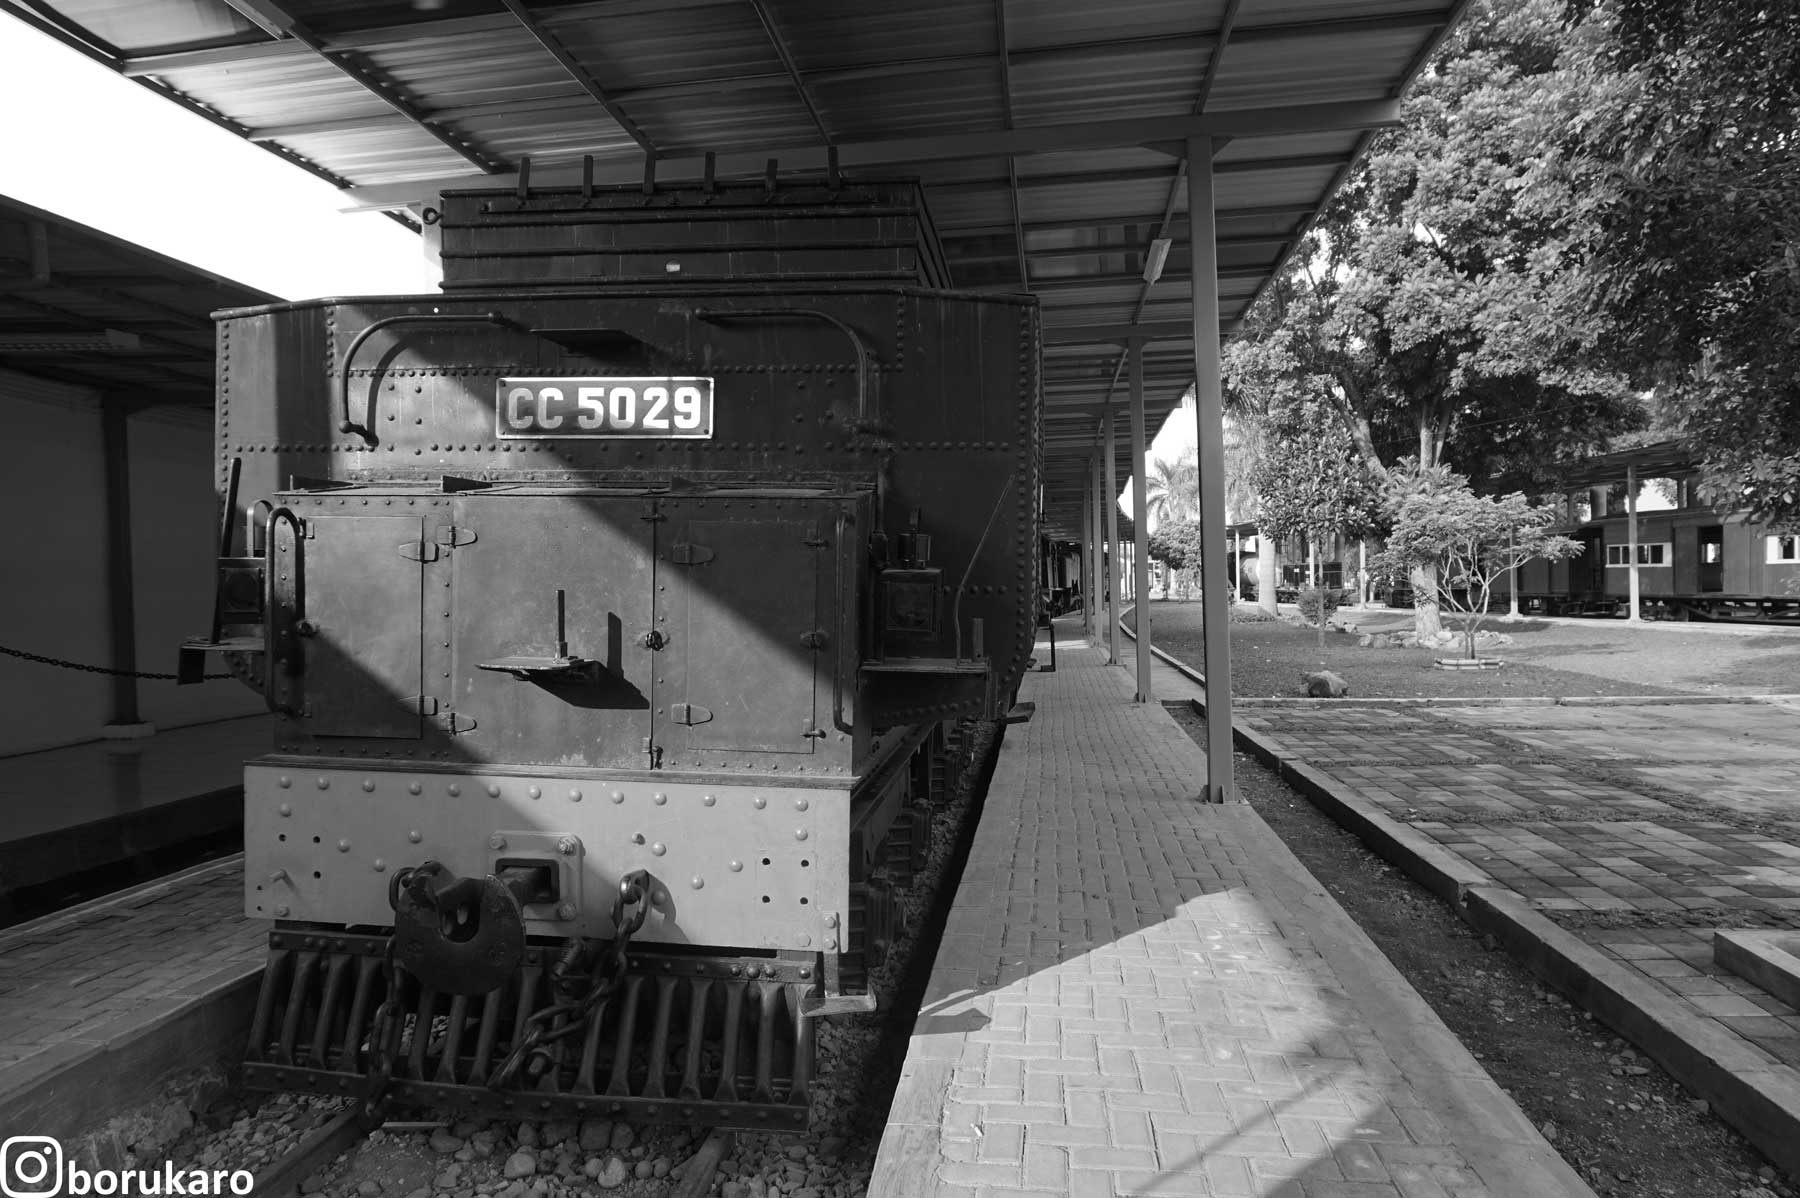 museum-kereta-api-ambarawa4-borukaro-com